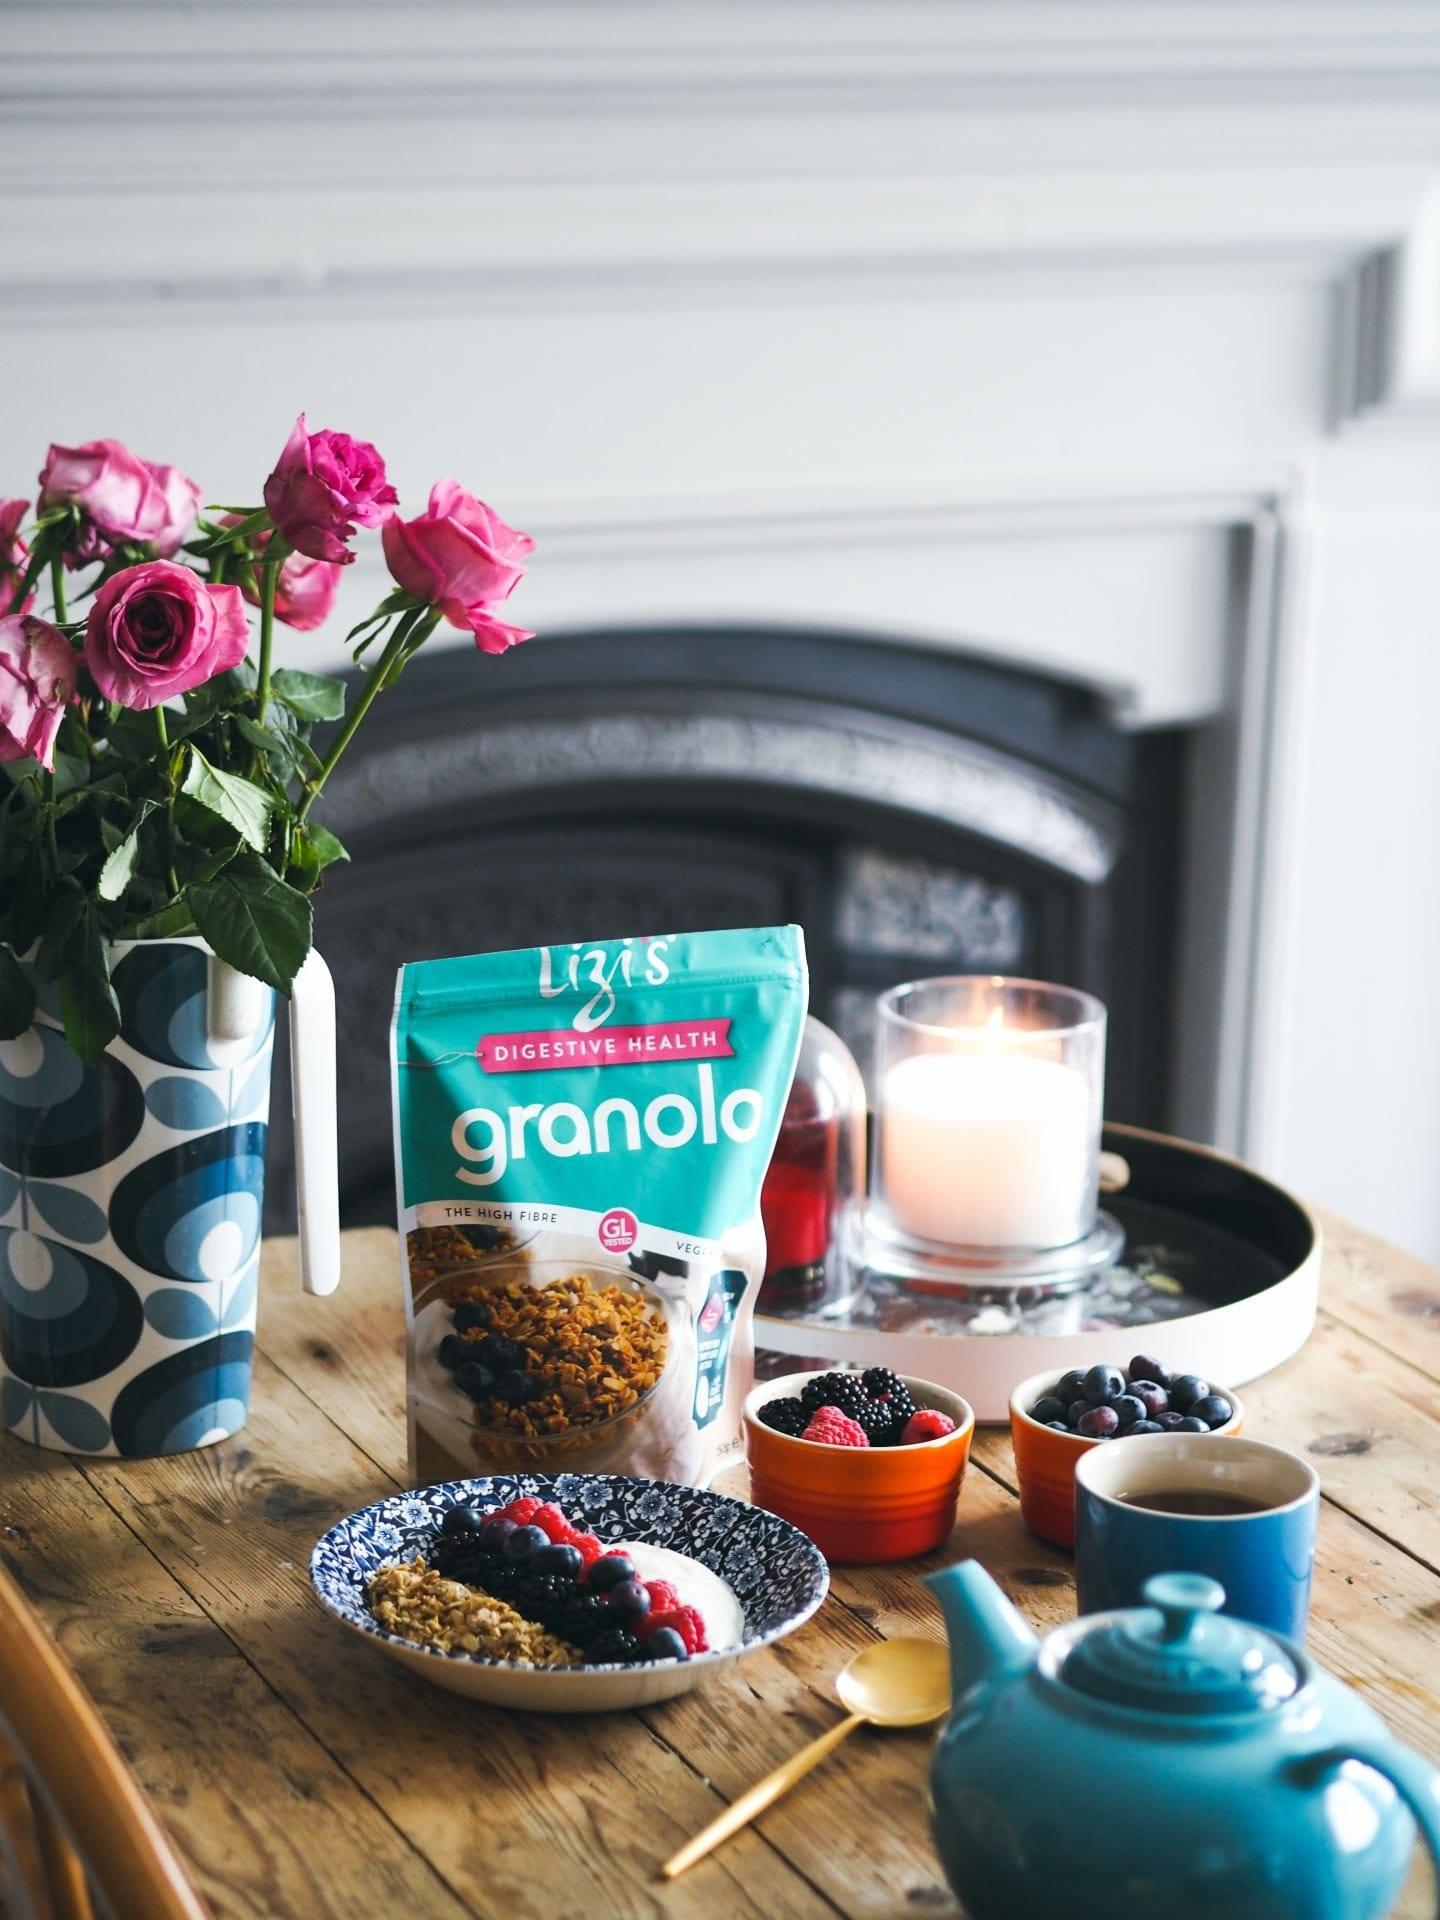 Lizi's Digestive Health Granola fashion for lunch blog